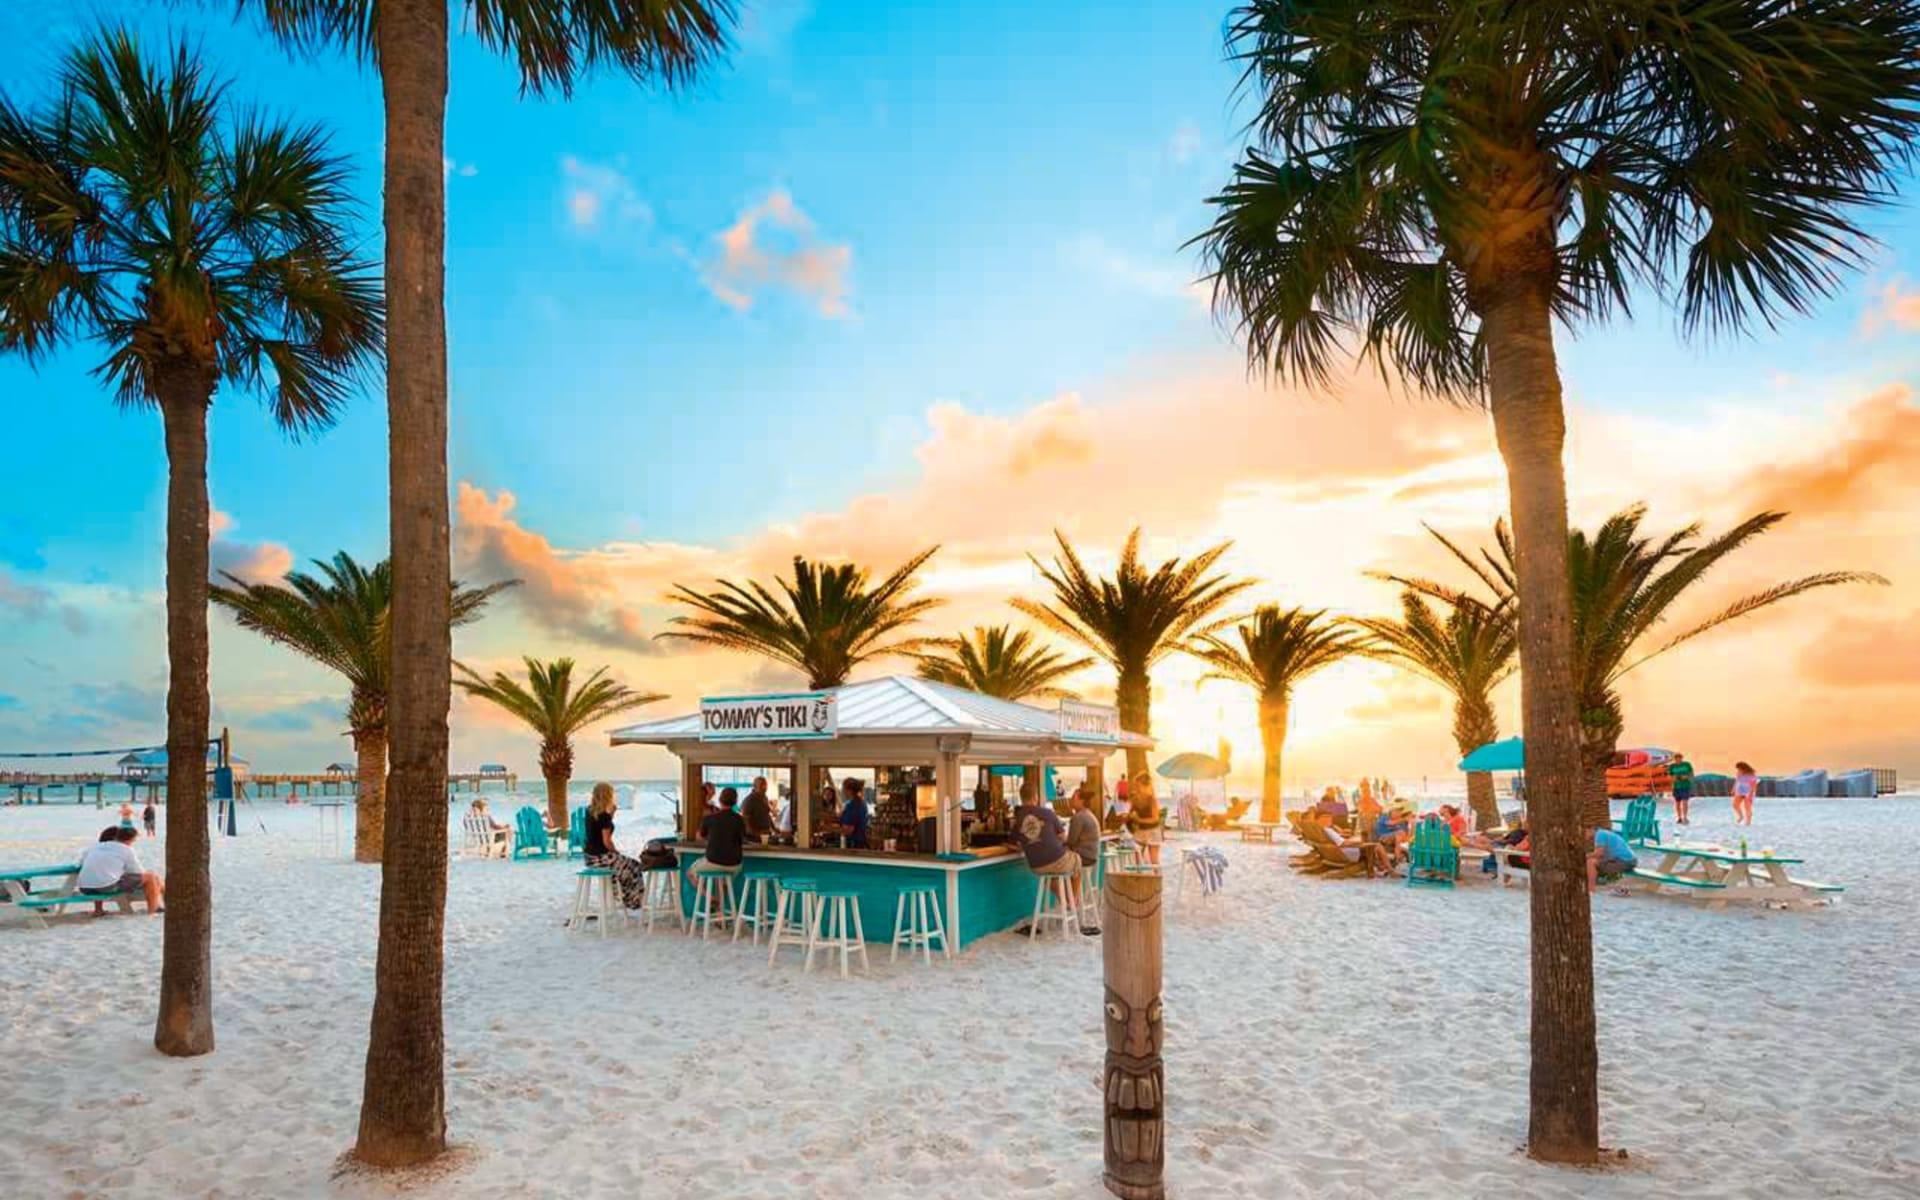 Hilton Clearwater Beach Resort: facilities hilton clearwater beach resort palmenstrand